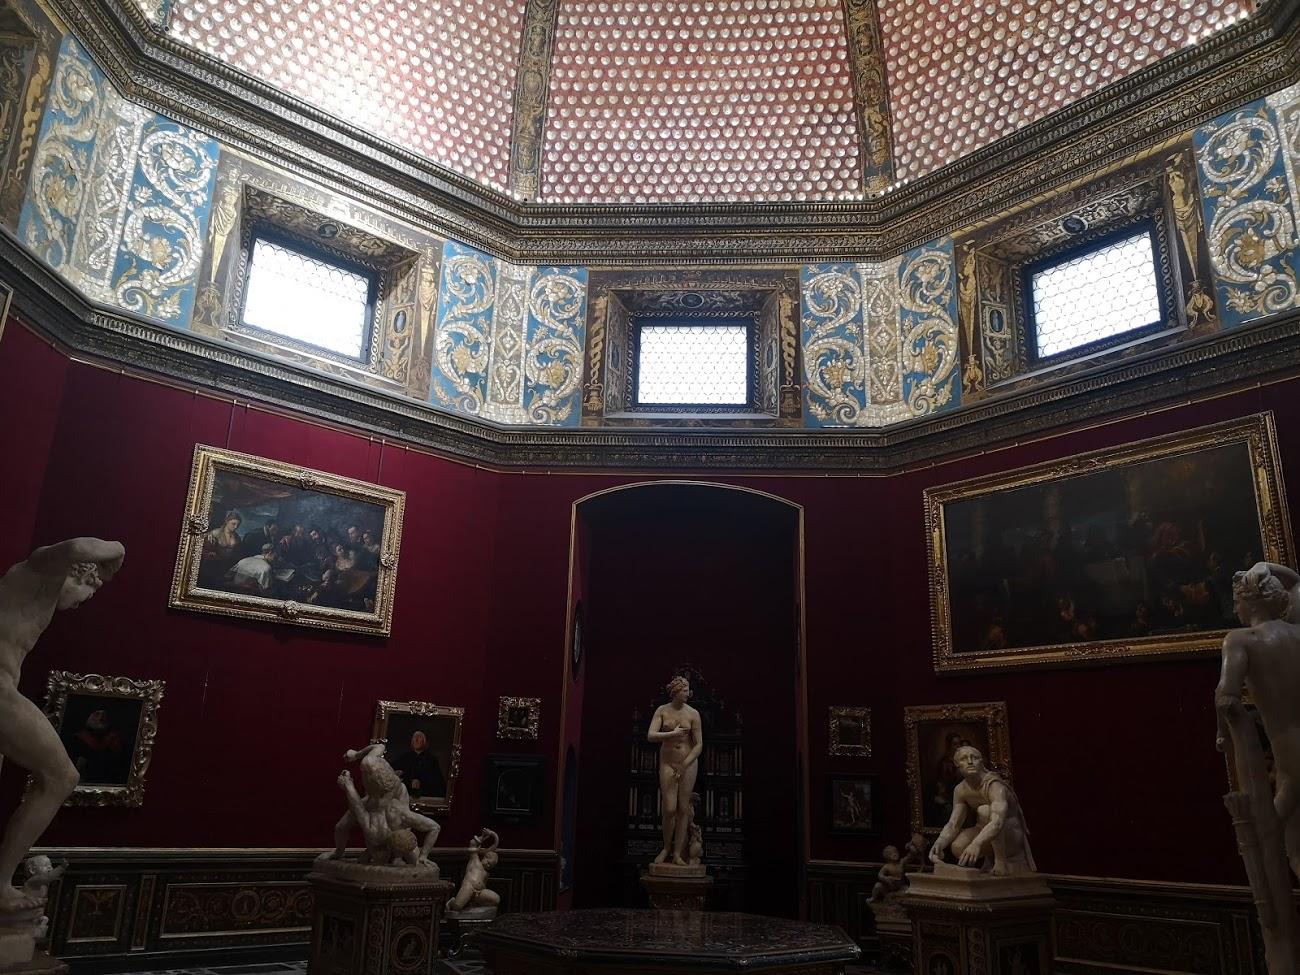 galeria Uffici- florencia - escultura - pintura